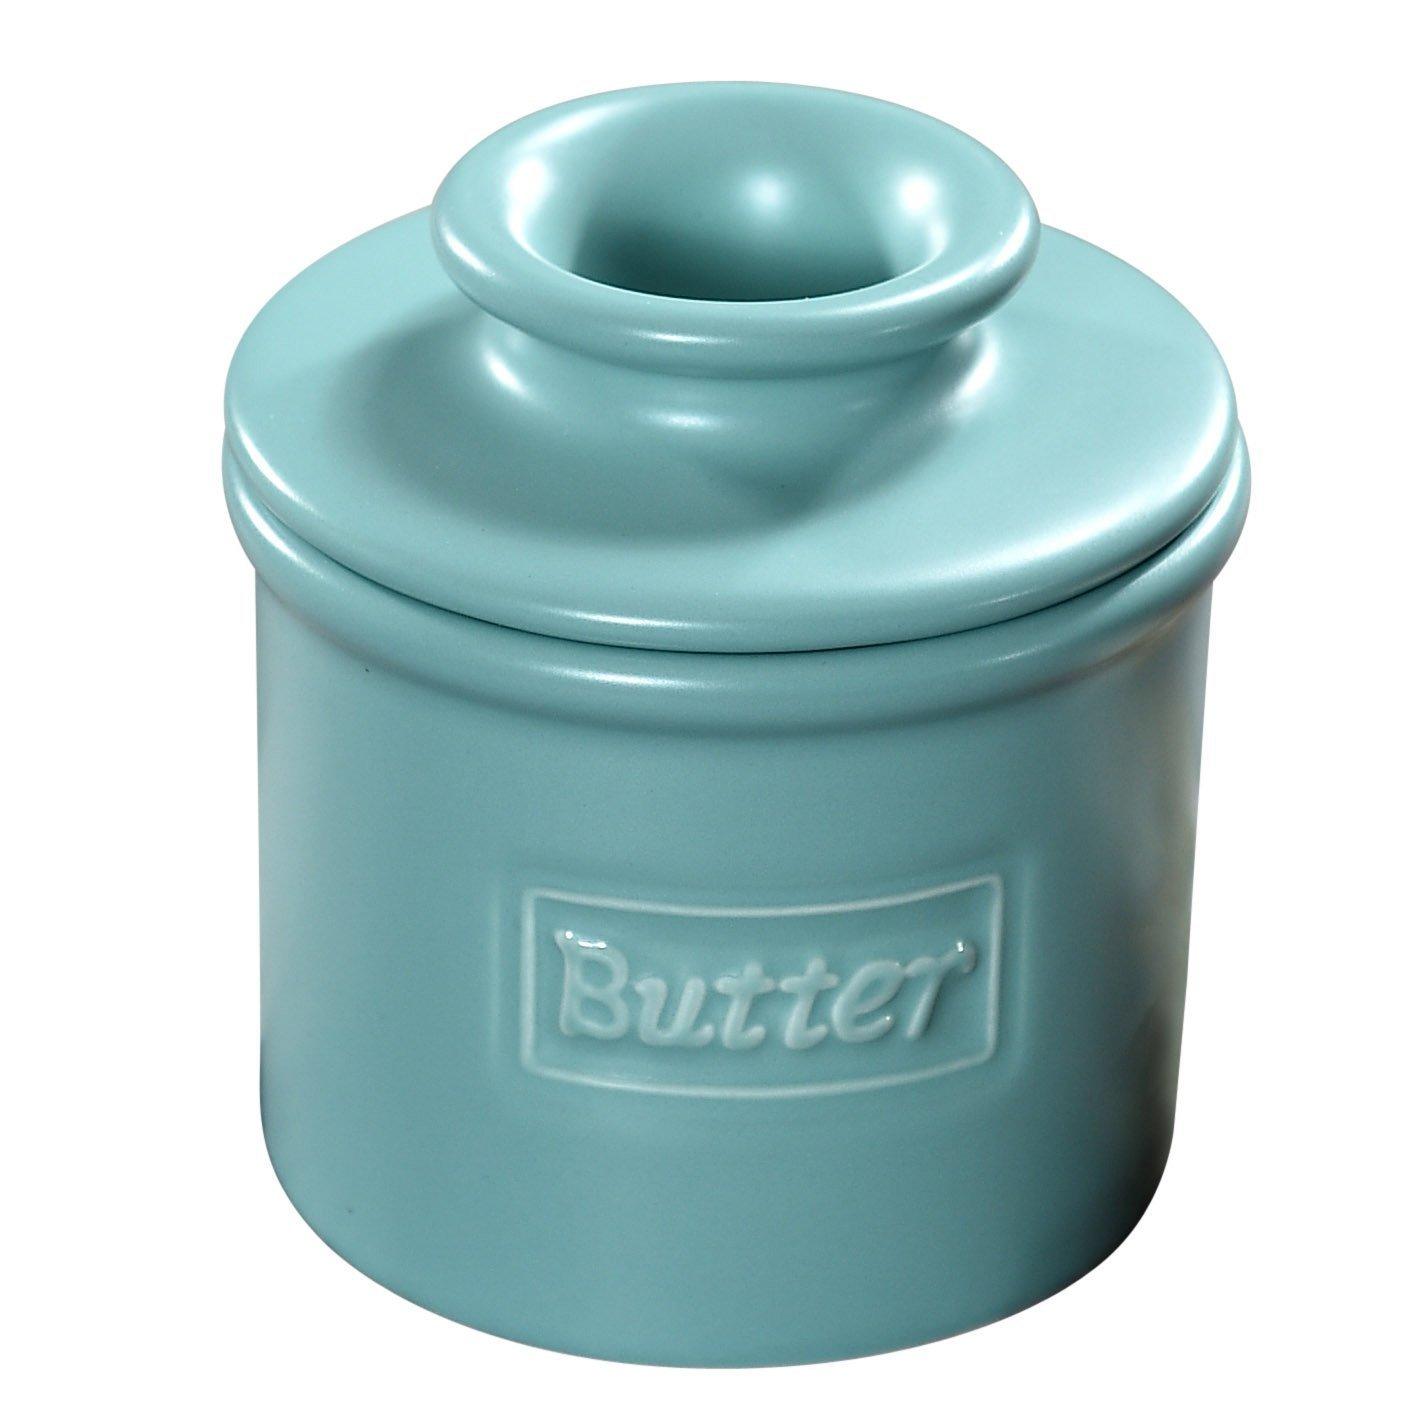 The Original Butter Bell Crock by L. Tremain, Cafe Matte Collection - Aqua Matte